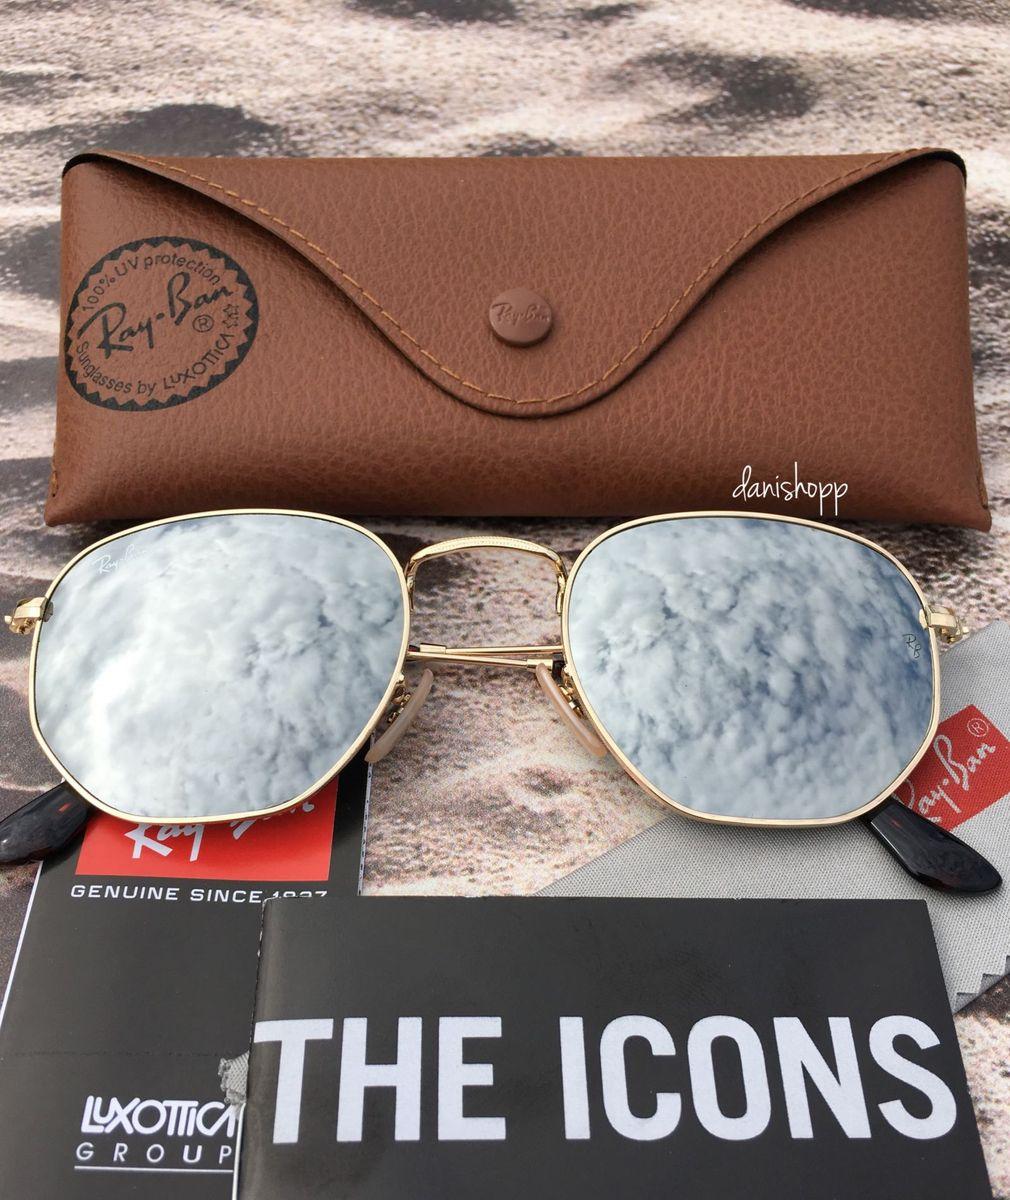 rayban hexagonal prata - óculos ray ban.  Czm6ly9wag90b3muzw5qb2vplmnvbs5ici9wcm9kdwn0cy80odaynza5lzm3ytg4ndu0odjlyjbimmjjngu1nmiwzwqwm2i4mta1lmpwzw  ... 7f048e225b